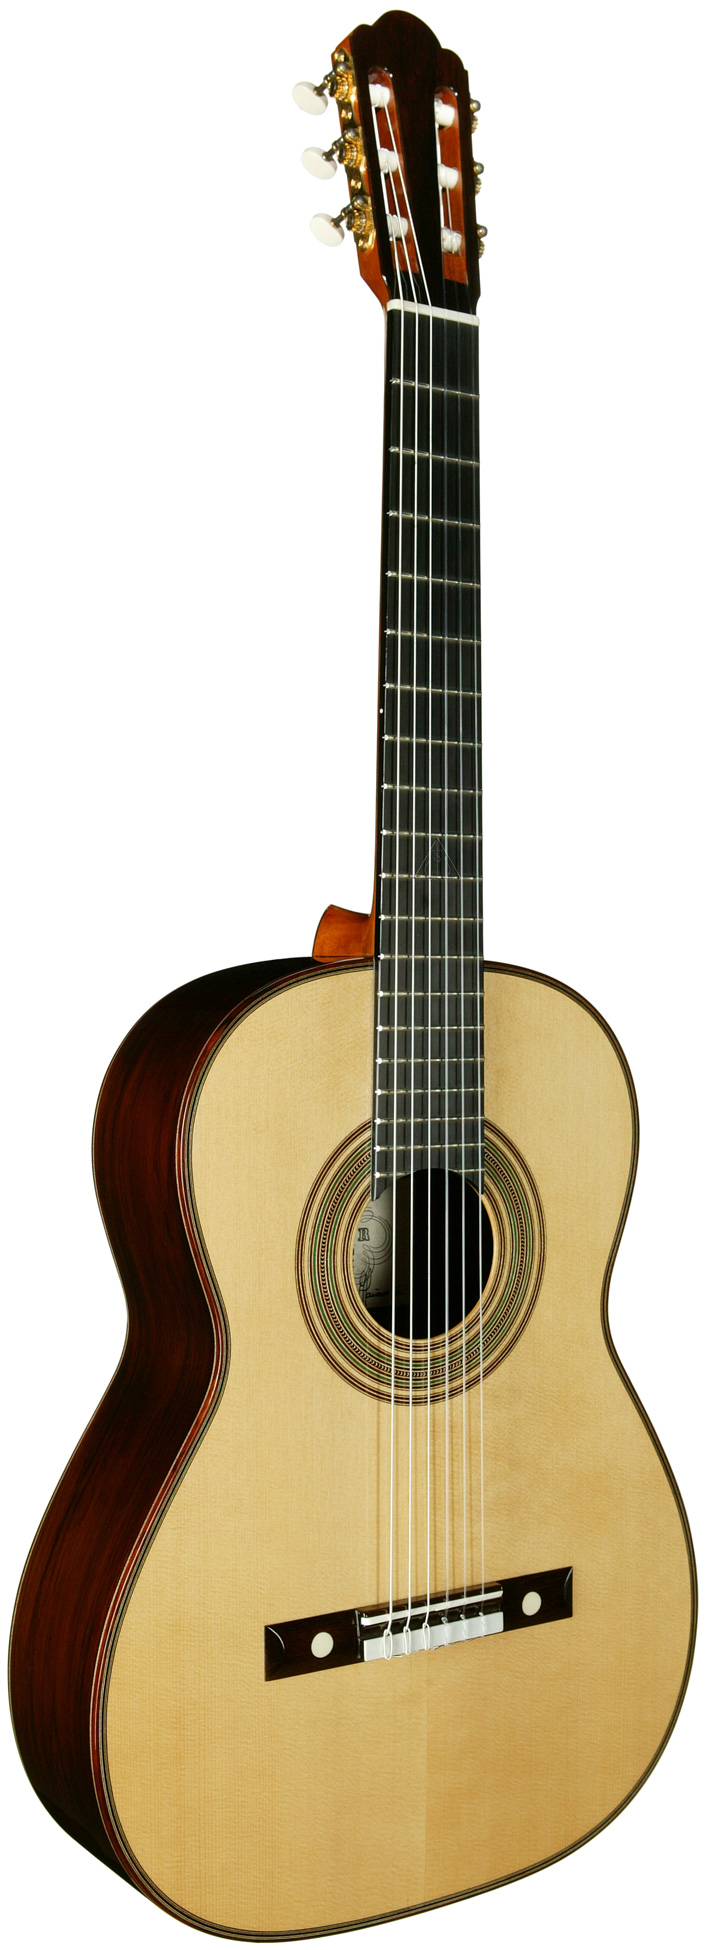 guitar_fa_lg_176.jpg